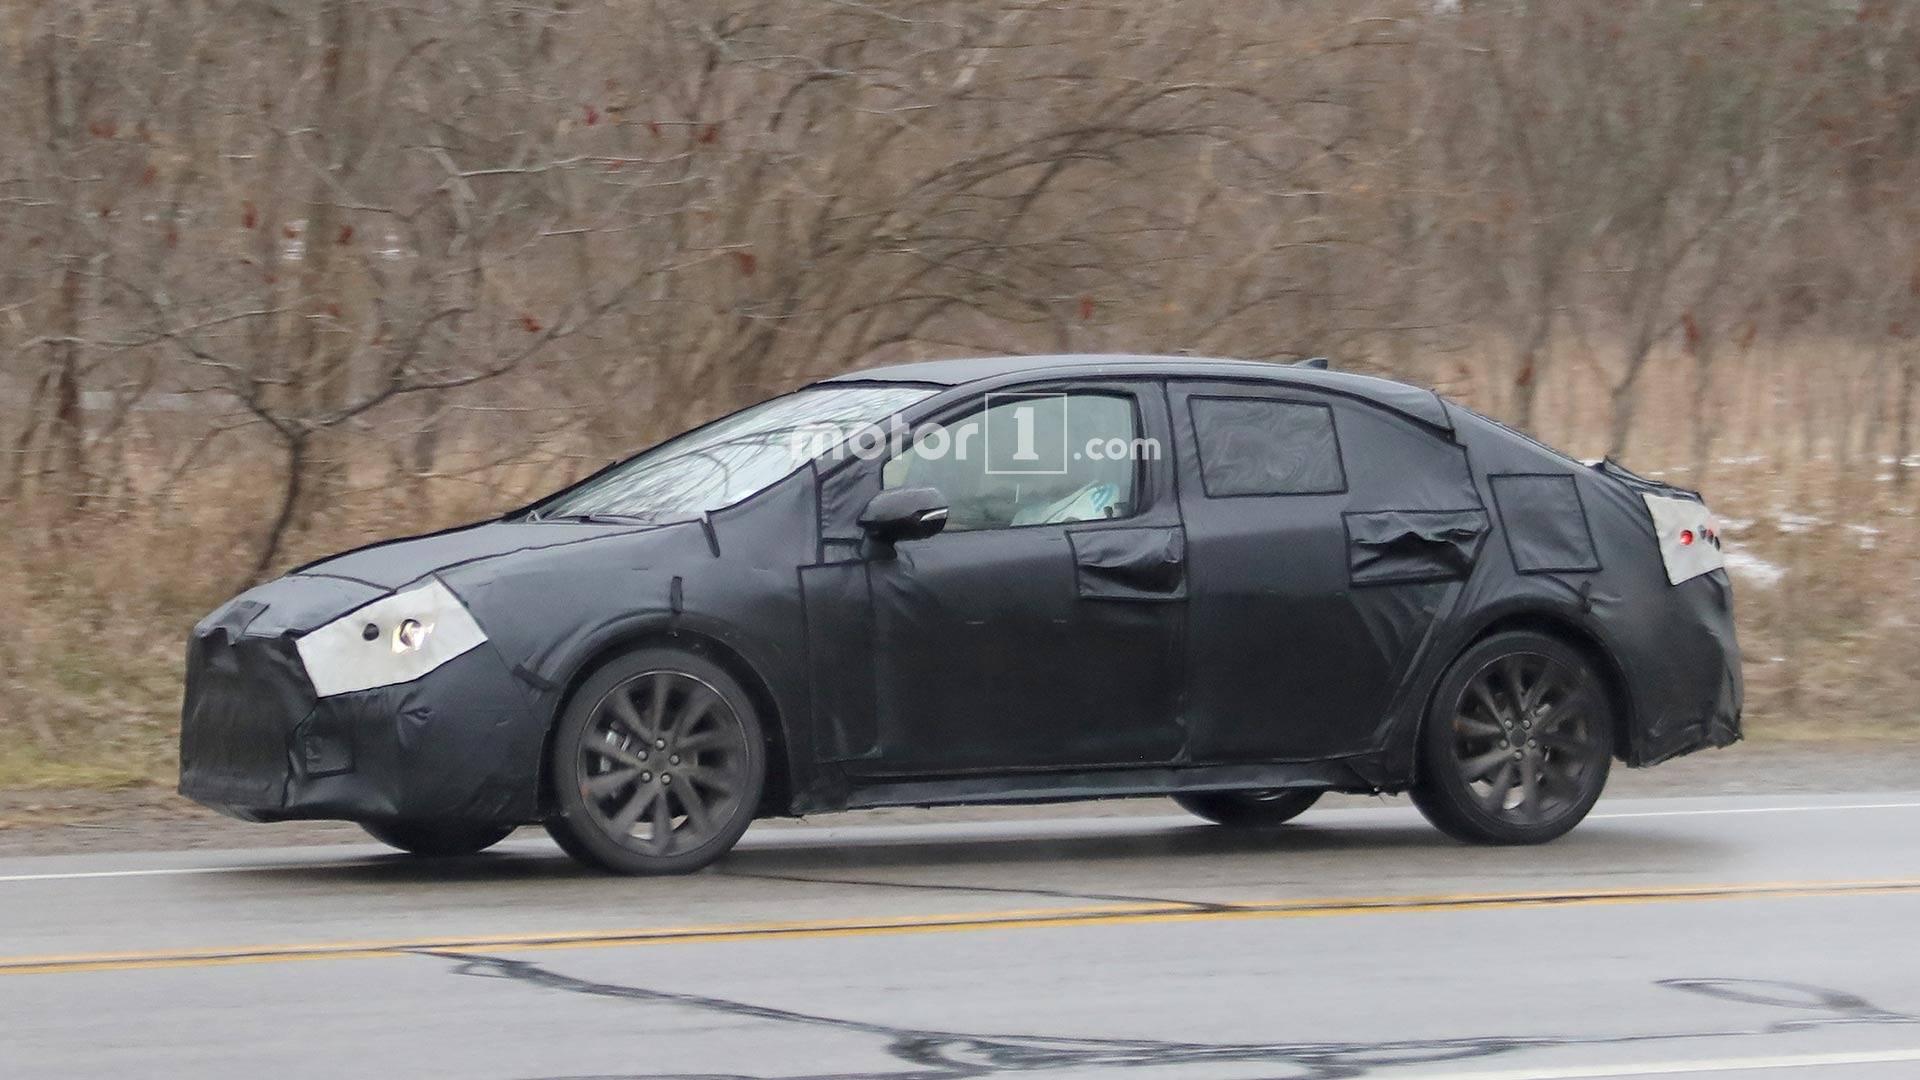 2021 New Toyota Avensis Spy Shots Reviews